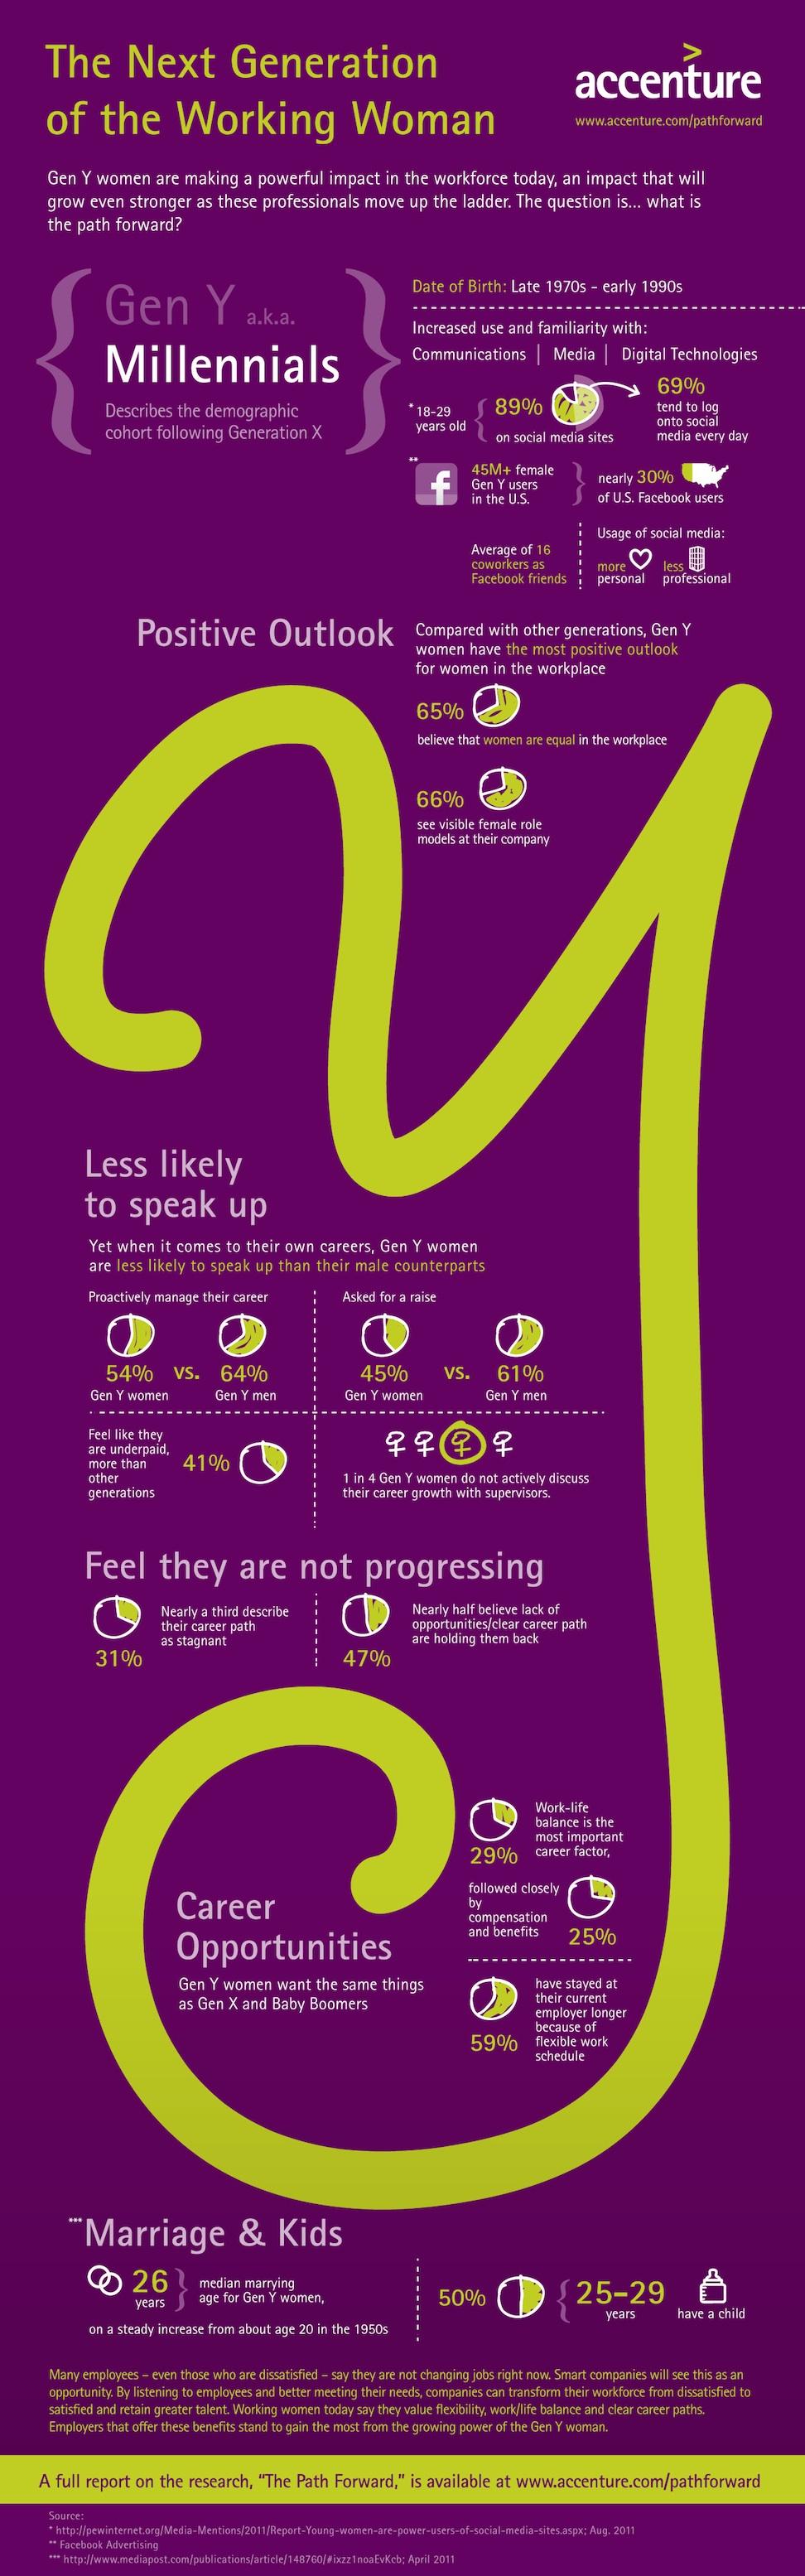 Generation Y Working Women Infographic